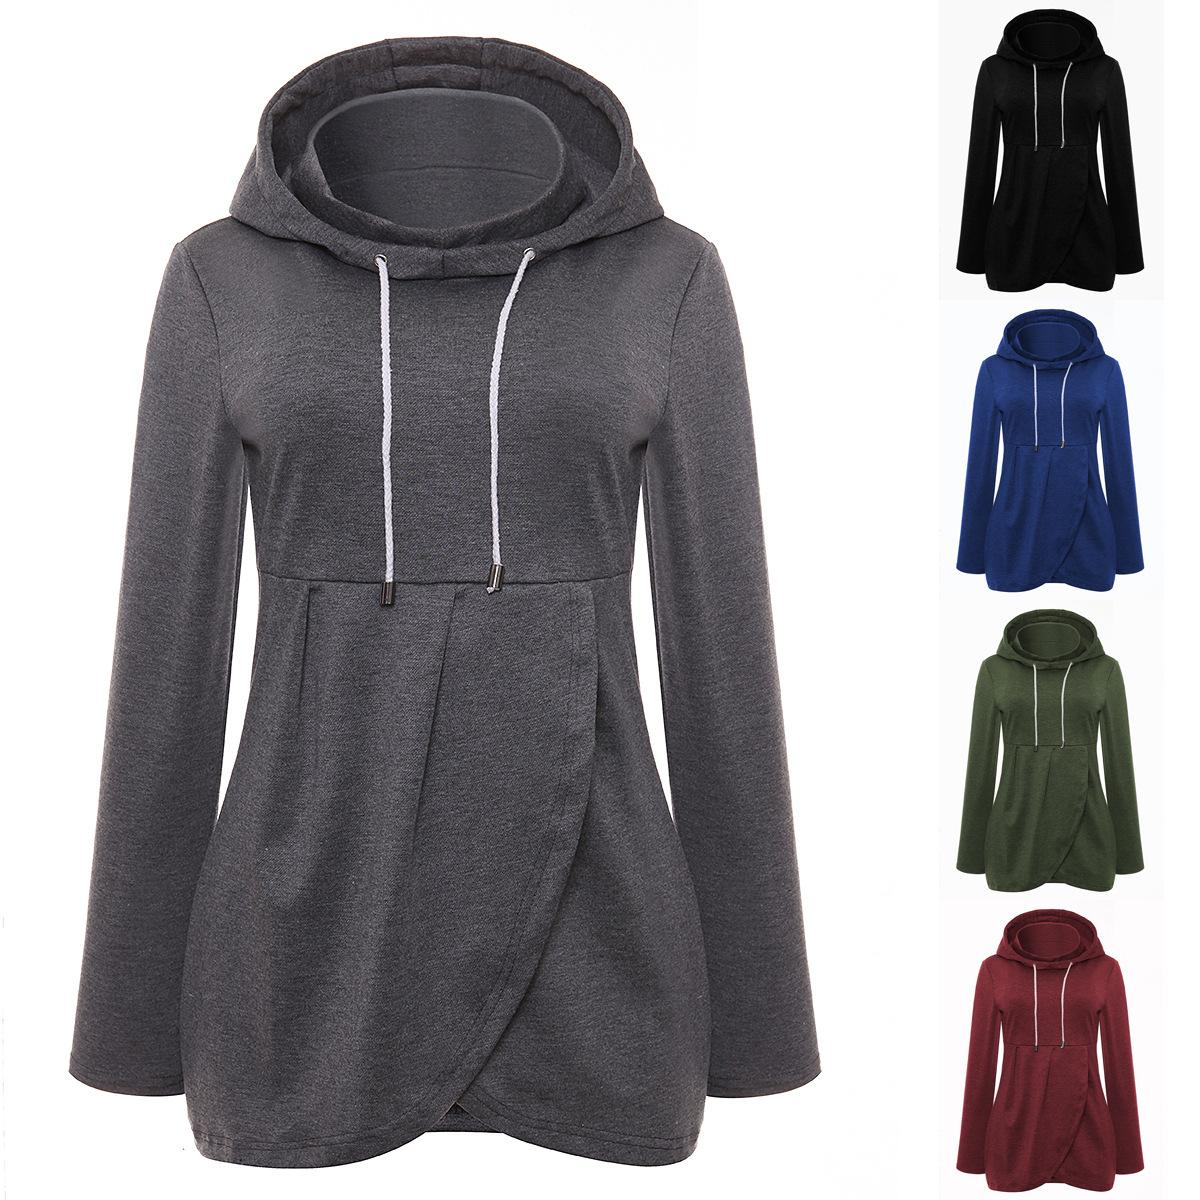 2019 Women Cotton Hoodies Women Solid Asymmetrical Hem Hooded Sweatshirts  Solid Turtle Neck Long Sleeve Slim Casual Winter Tops From Hengytrade e2e099ef53